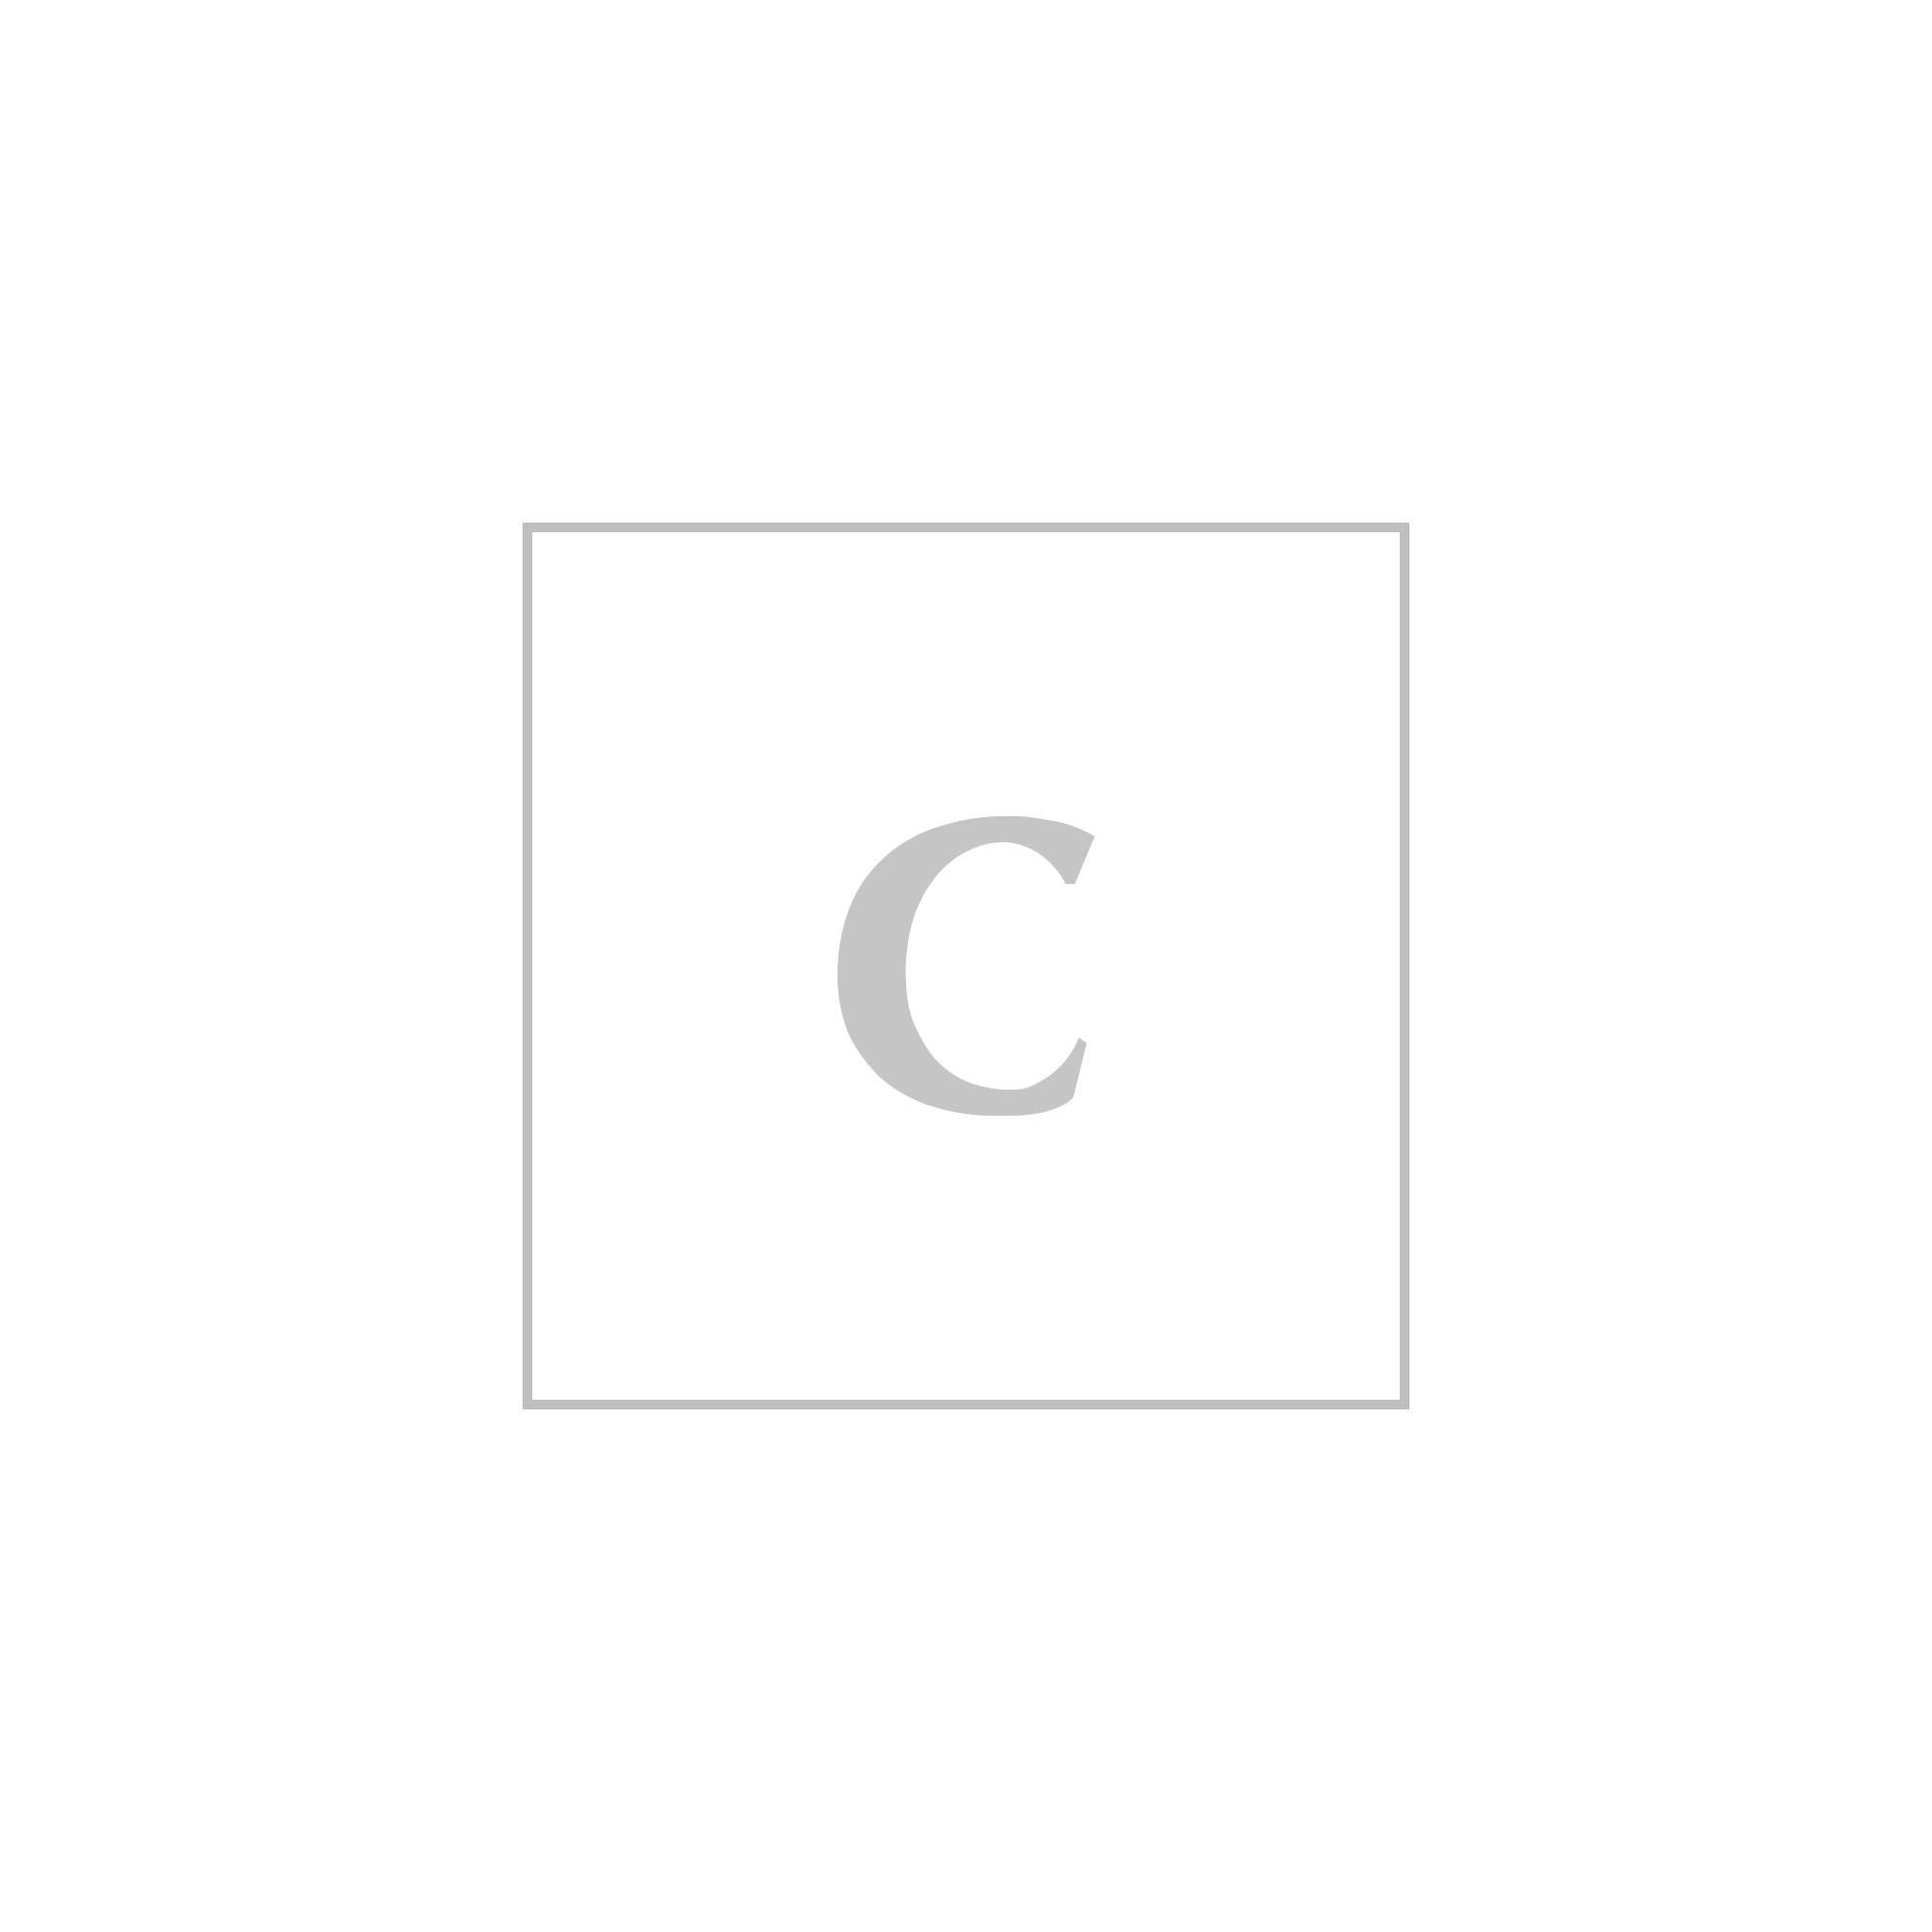 Stella mccartney tiny falabella metallic crackl bag